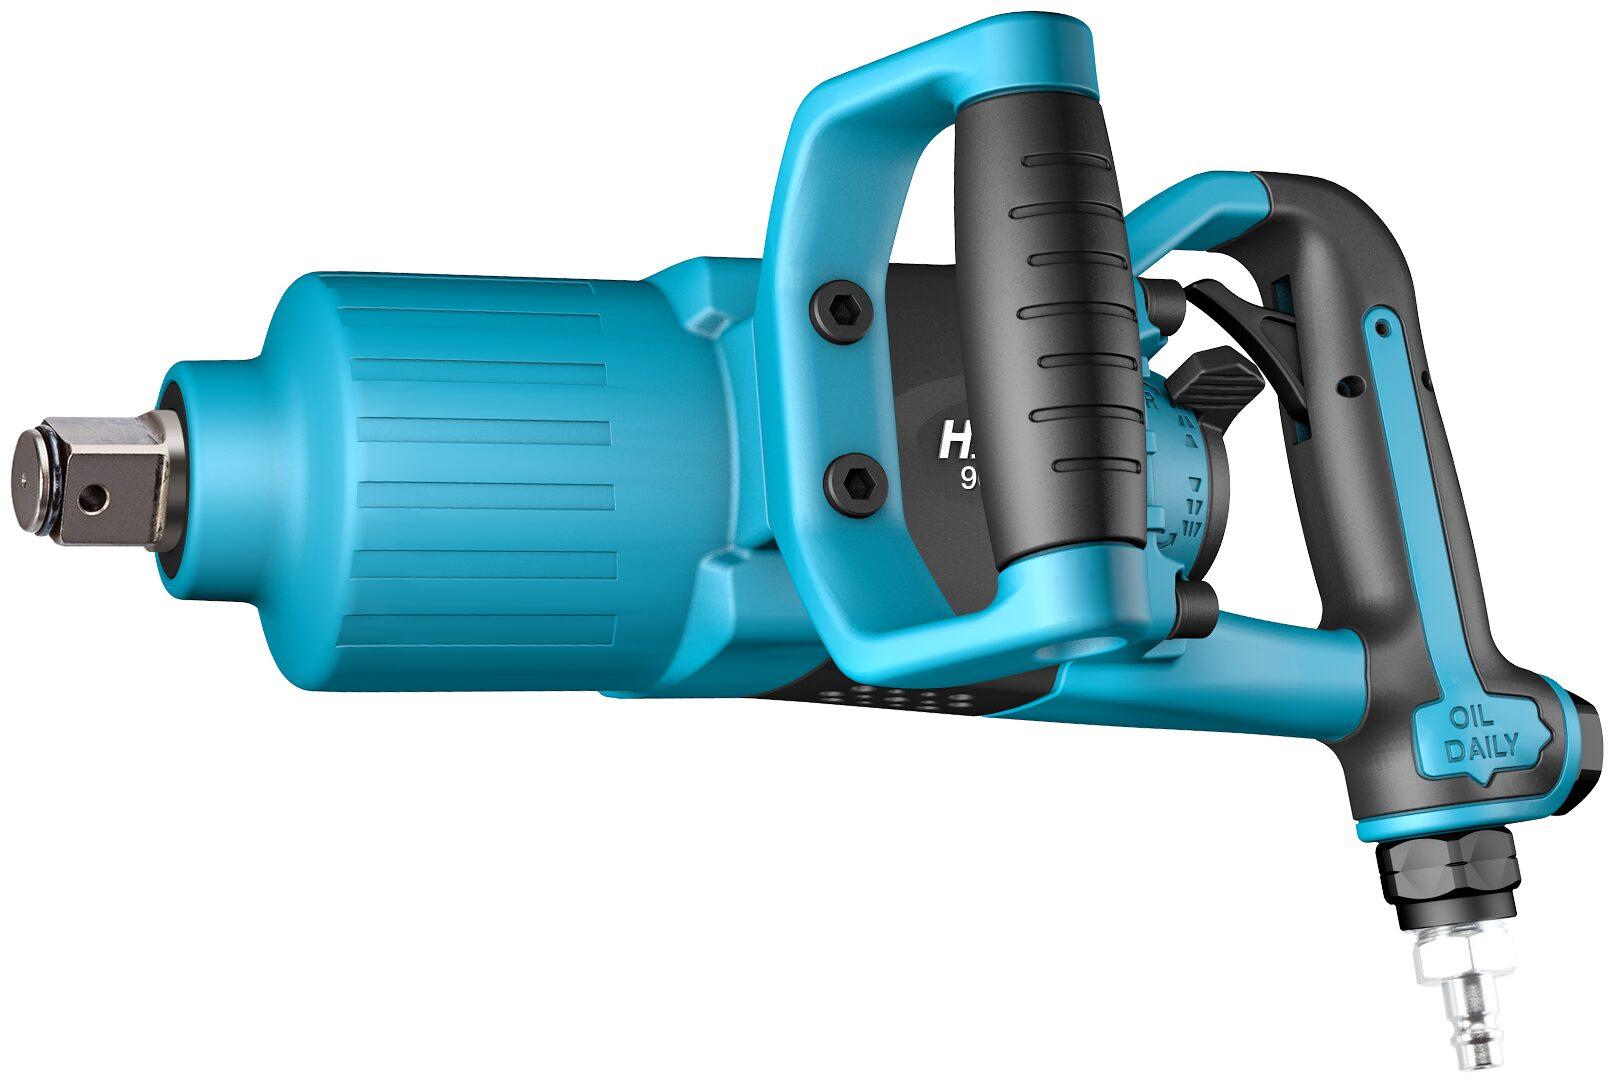 HAZET Schlagschrauber 9014PS-1 ∙ Lösemoment maximal: 3400 Nm ∙ Vierkant massiv 25 mm (1 Zoll) ∙ Direkthammer-Schlagwerk